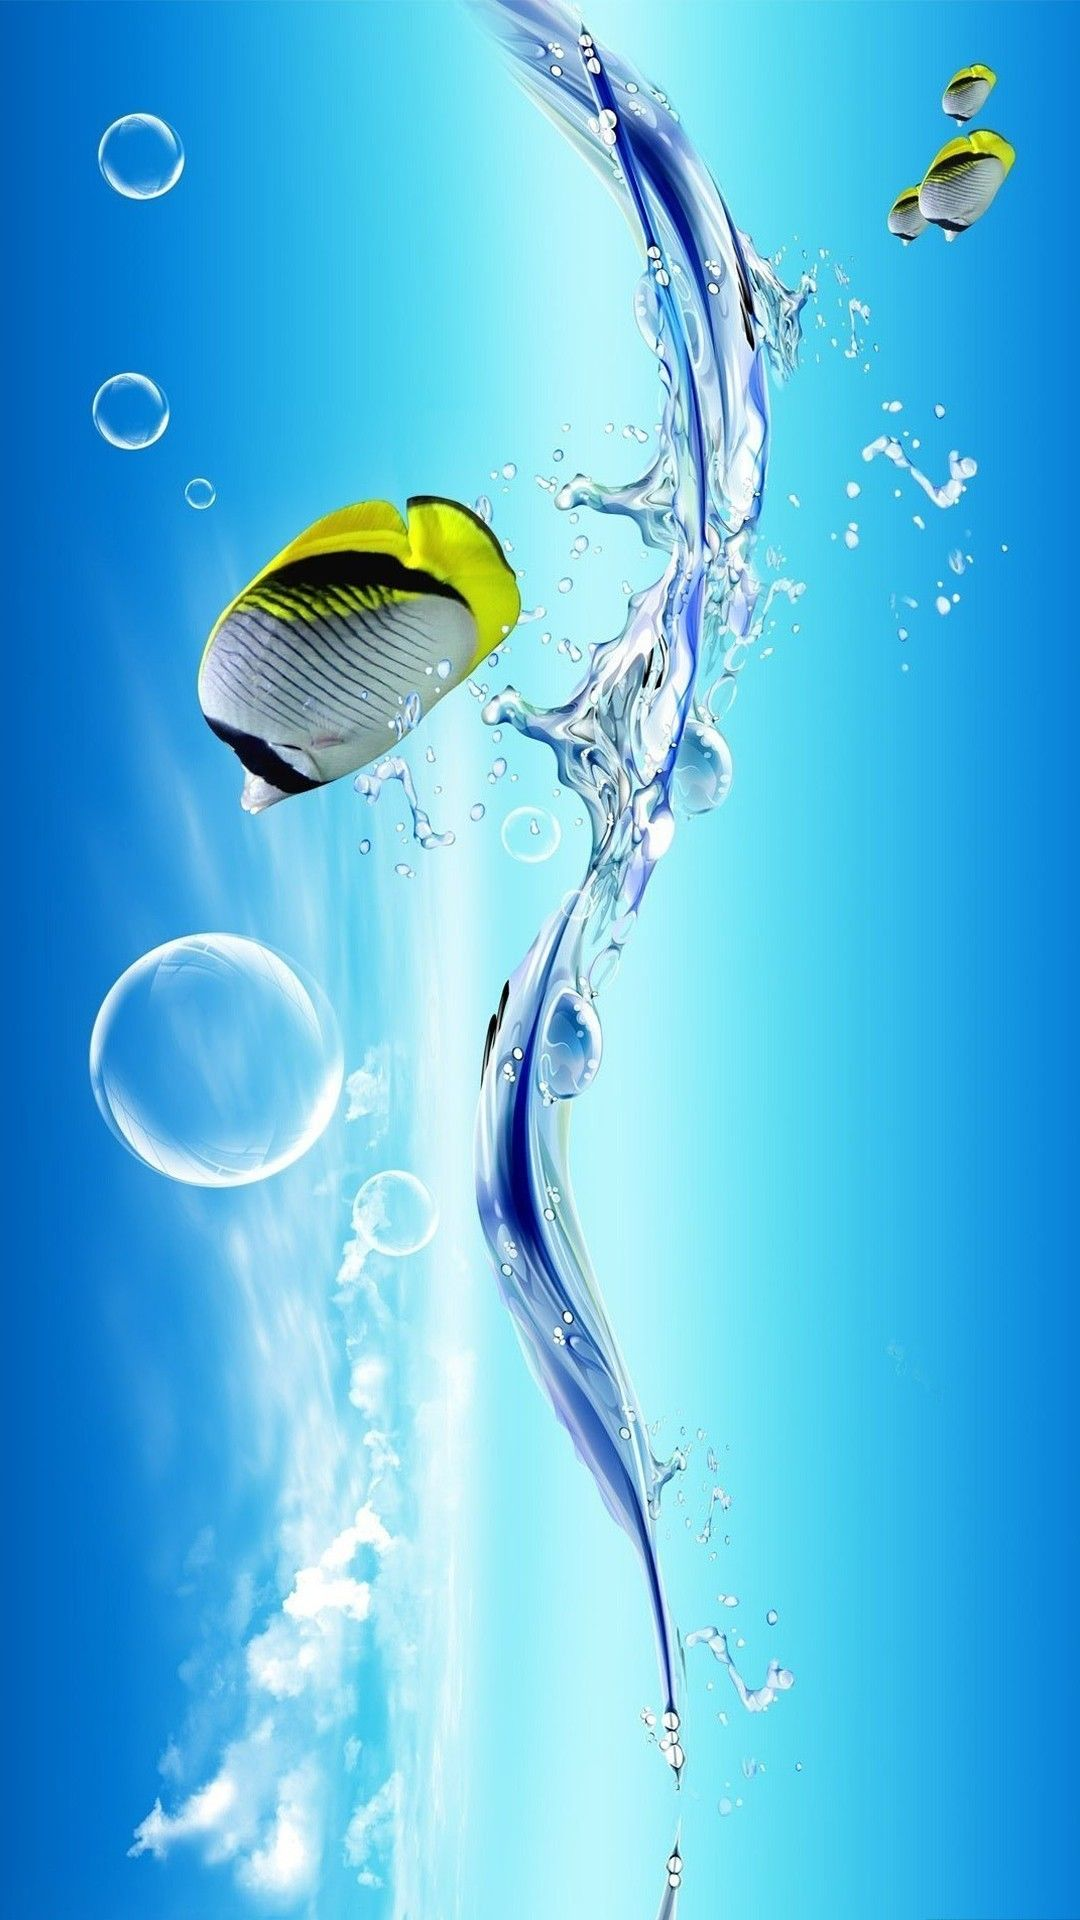 3d Clownfish Iphone 6 Plus Wallpaper Ocean Fish Water Bubble Mobilee